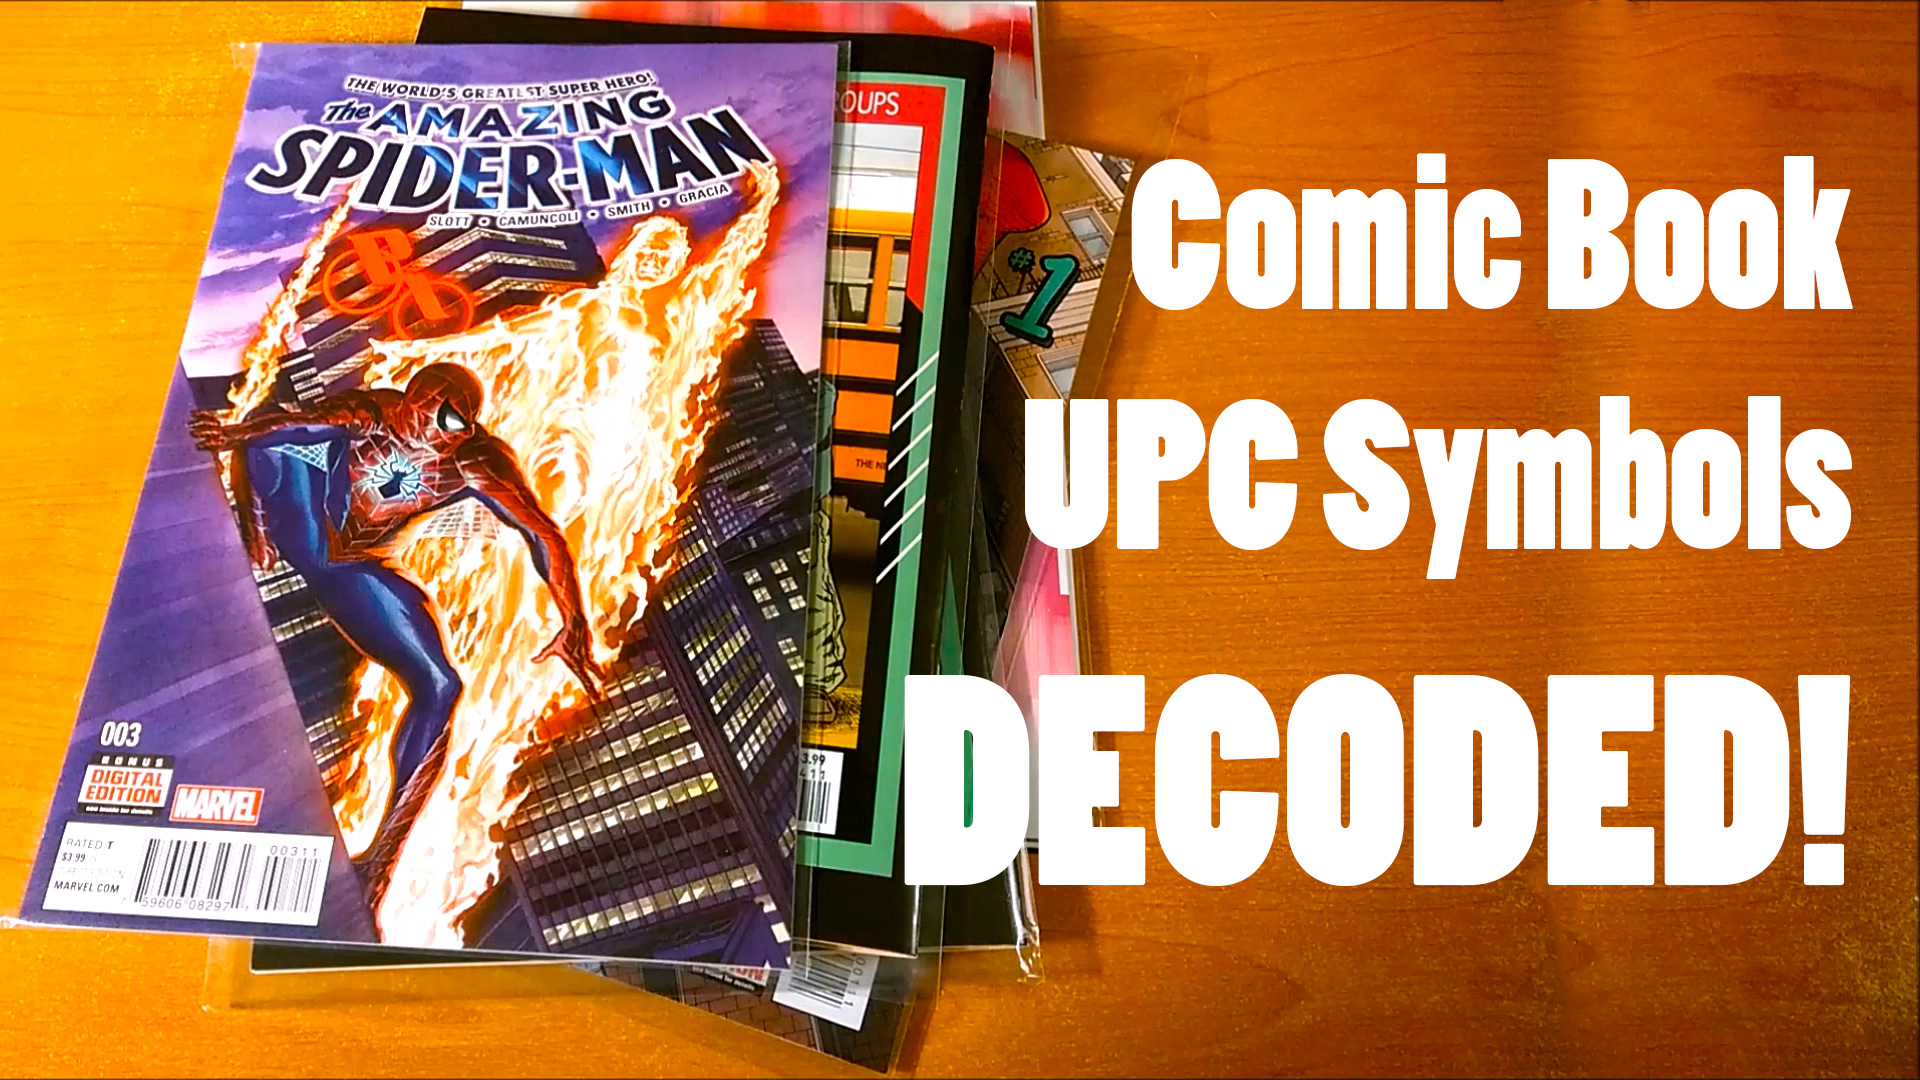 Comic Book UPC Symbols Decoded